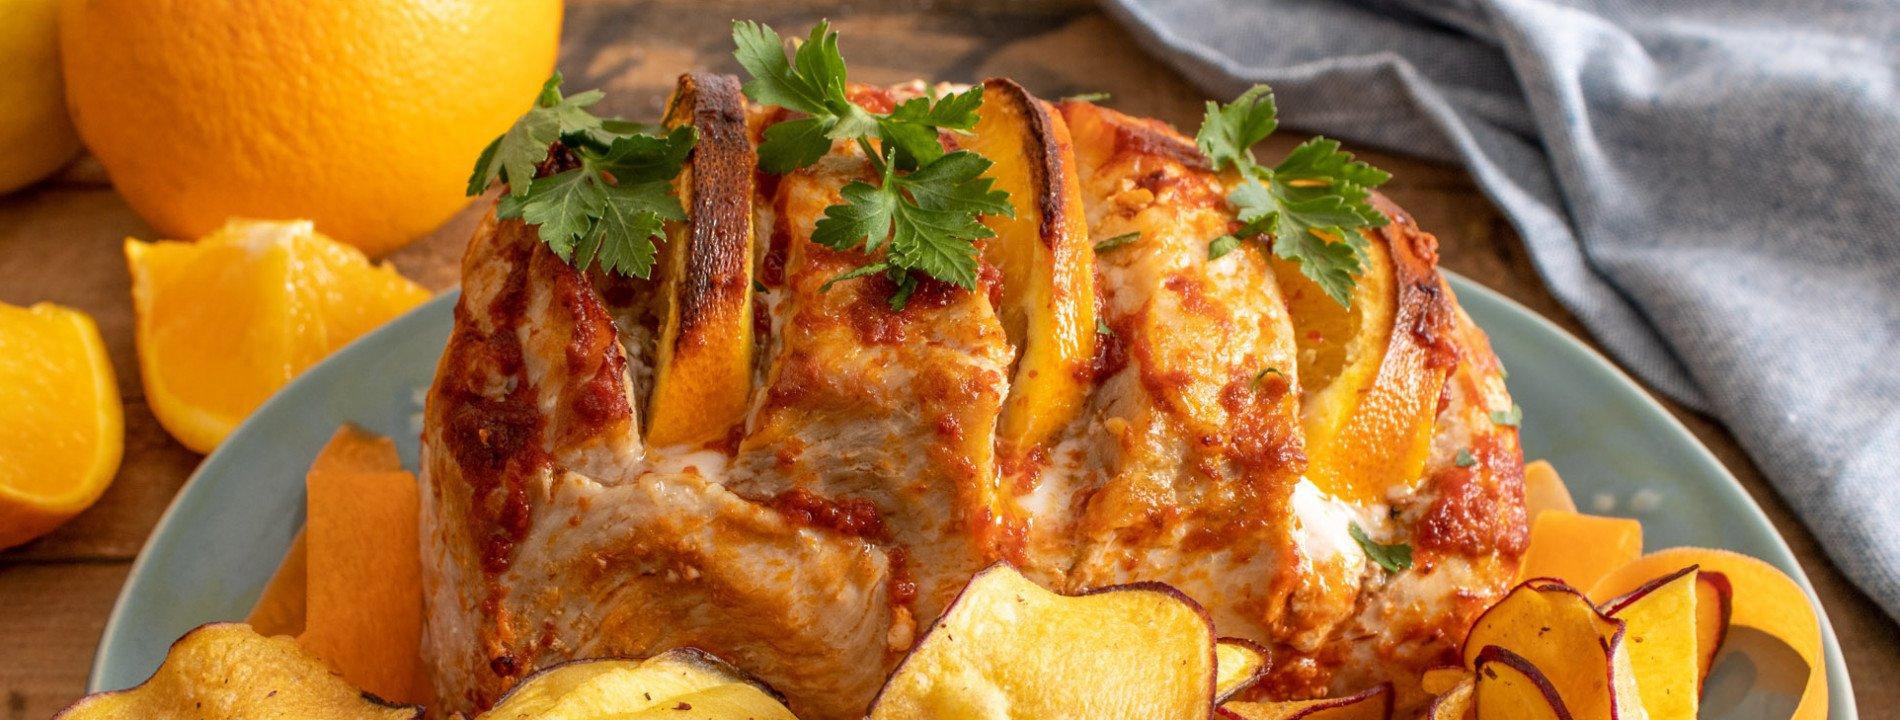 Pork Loin with Orange